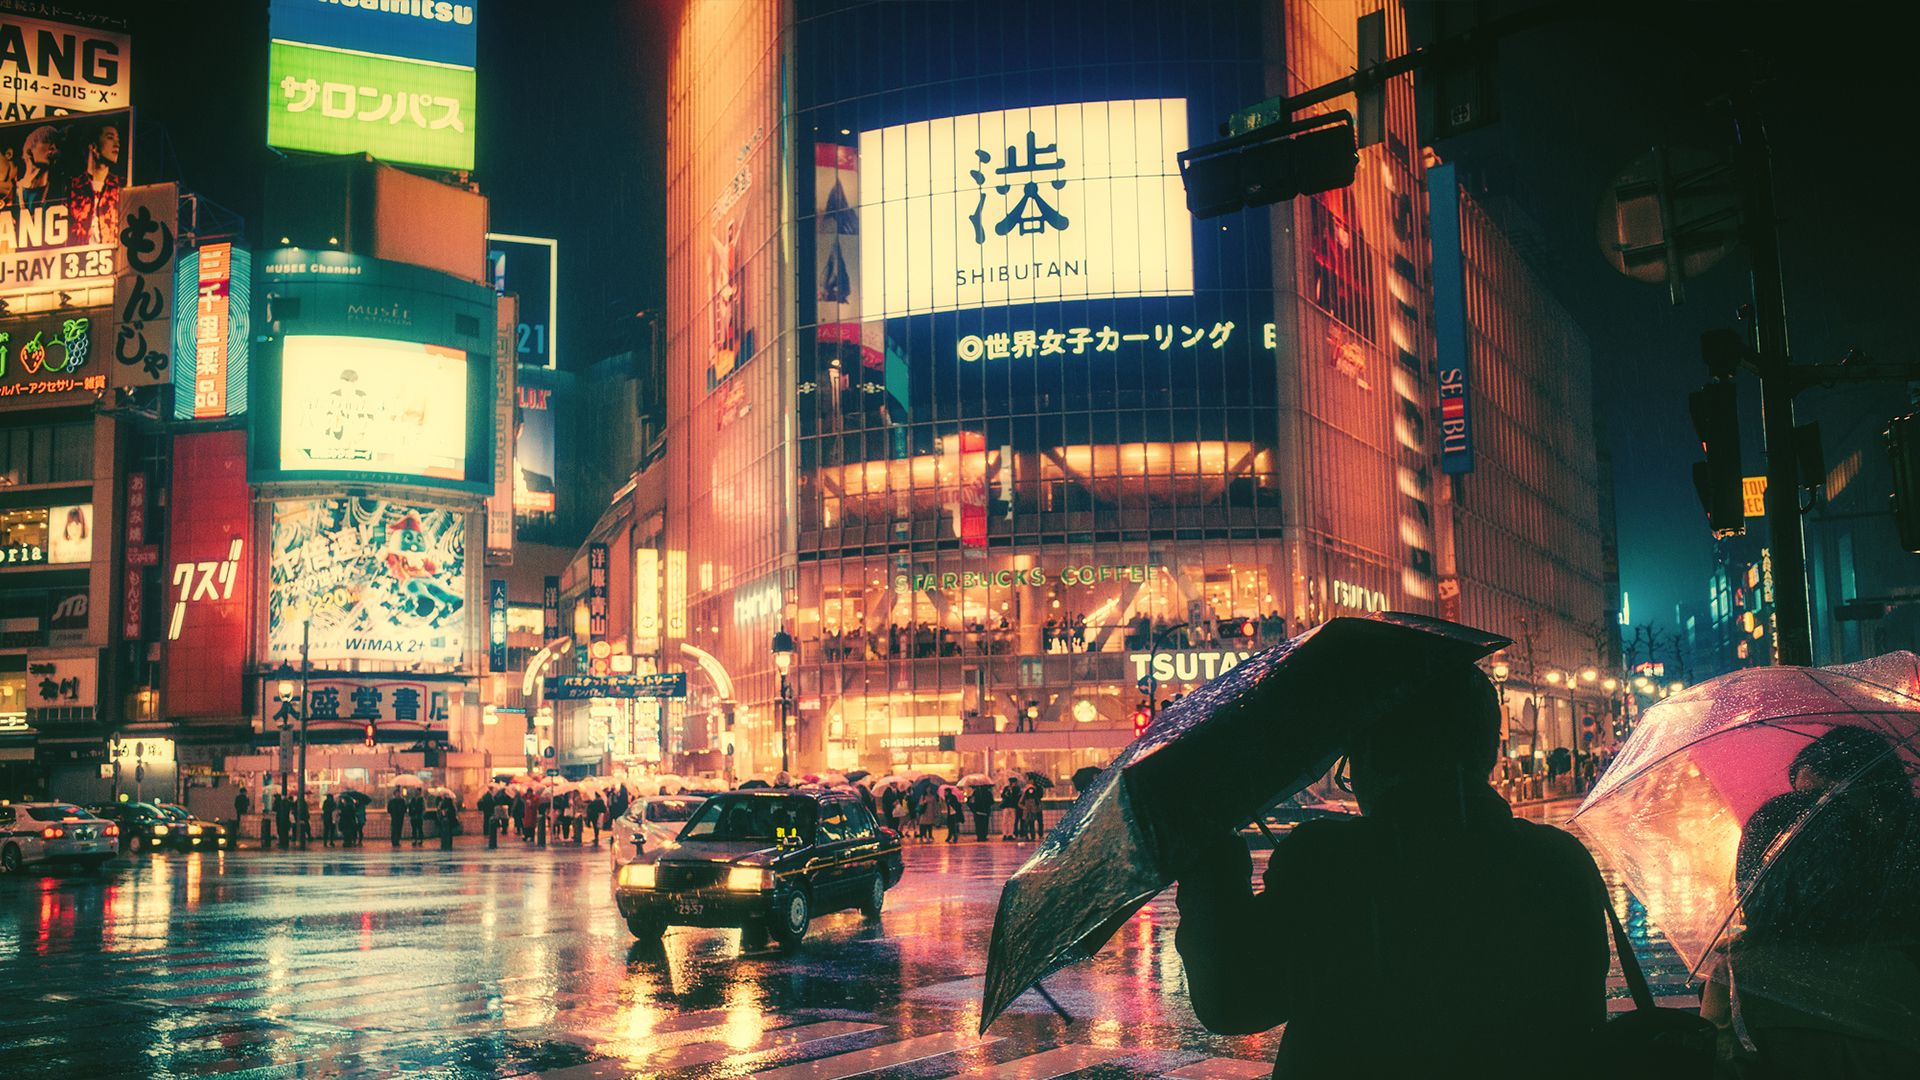 Crossing in the rain Shibuya Tokyo. [1920x1080] 写真のアイデア